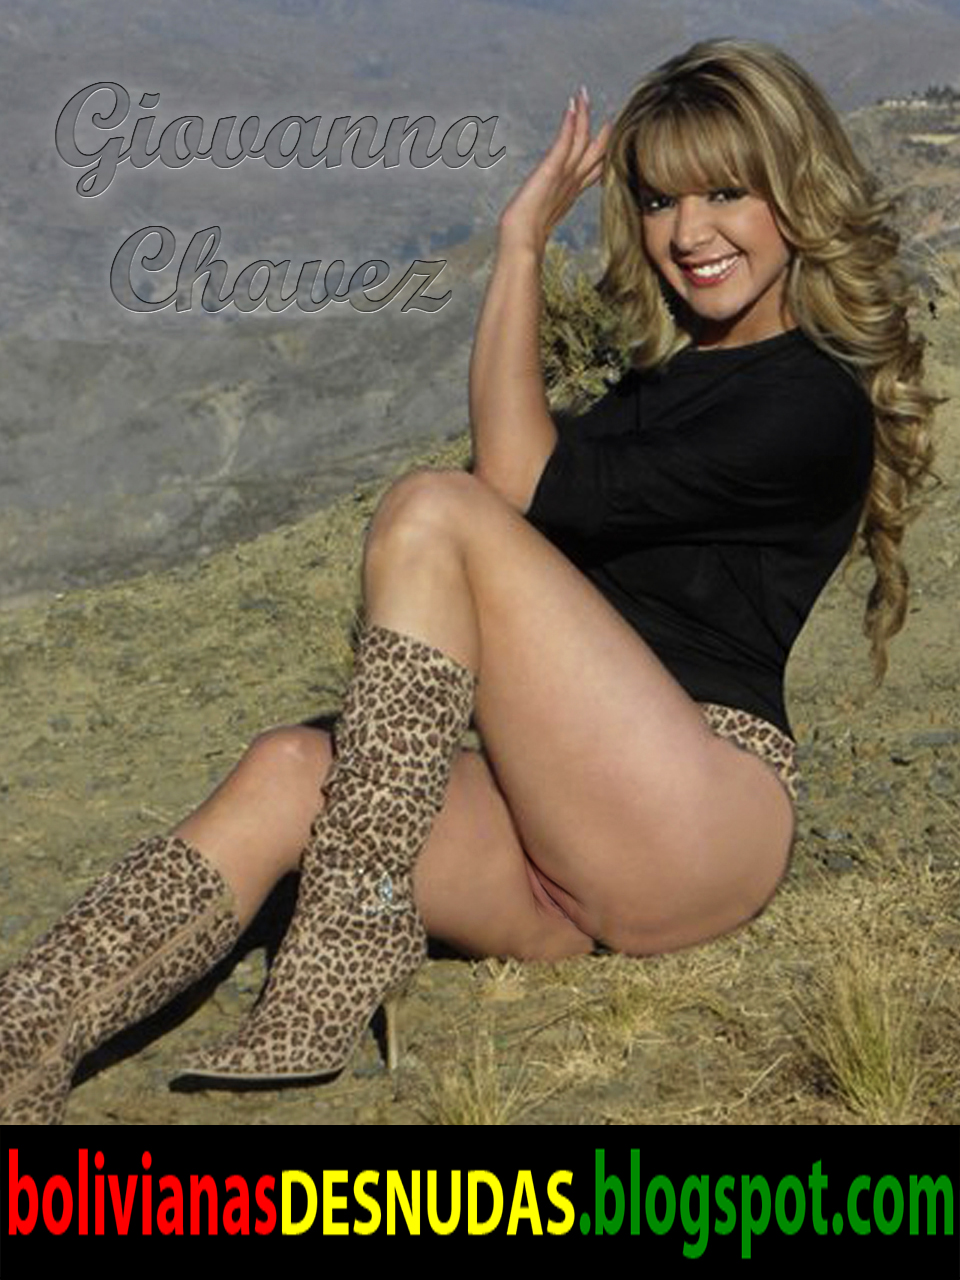 Bolivianas Famosas Desnudas Fake Giovanna Chavez Desnuda Y Abriendo